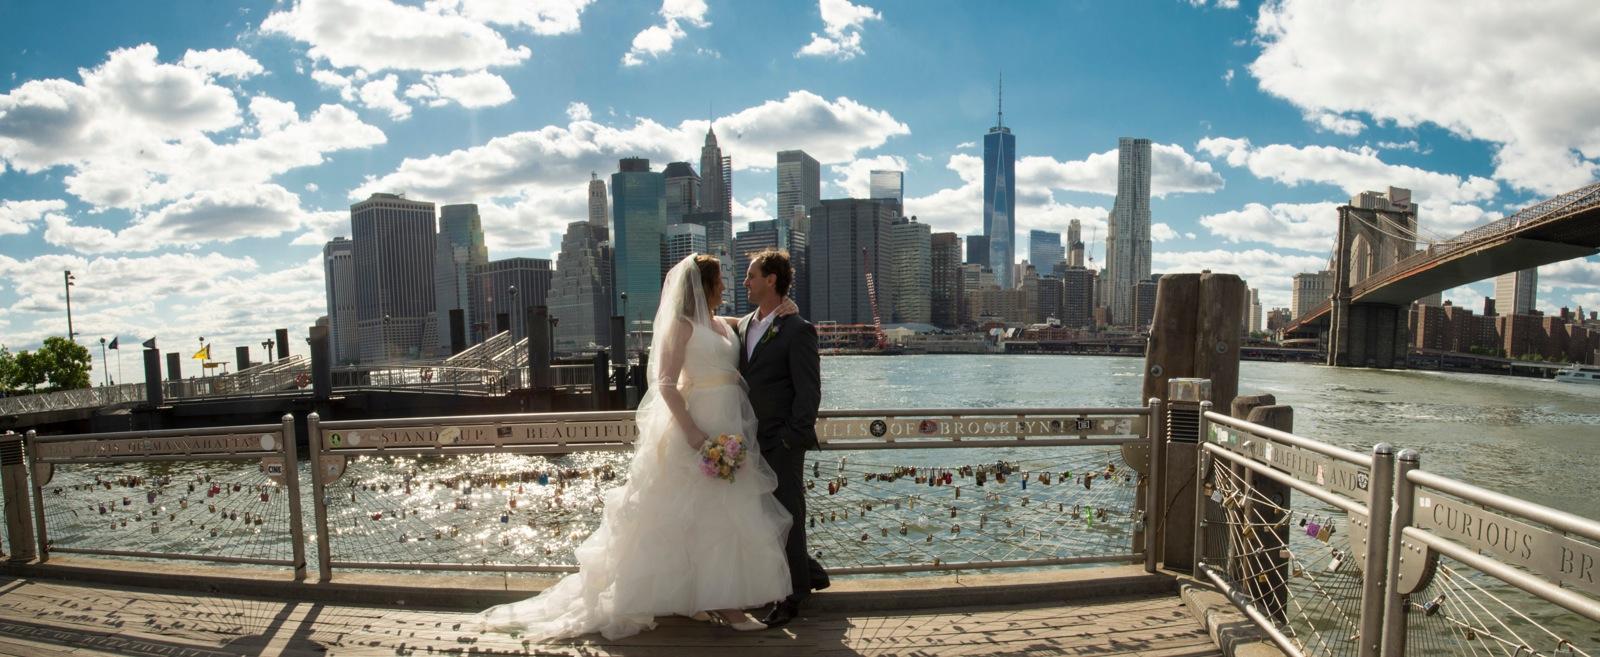 The East River, Brooklyn Bridge panorama